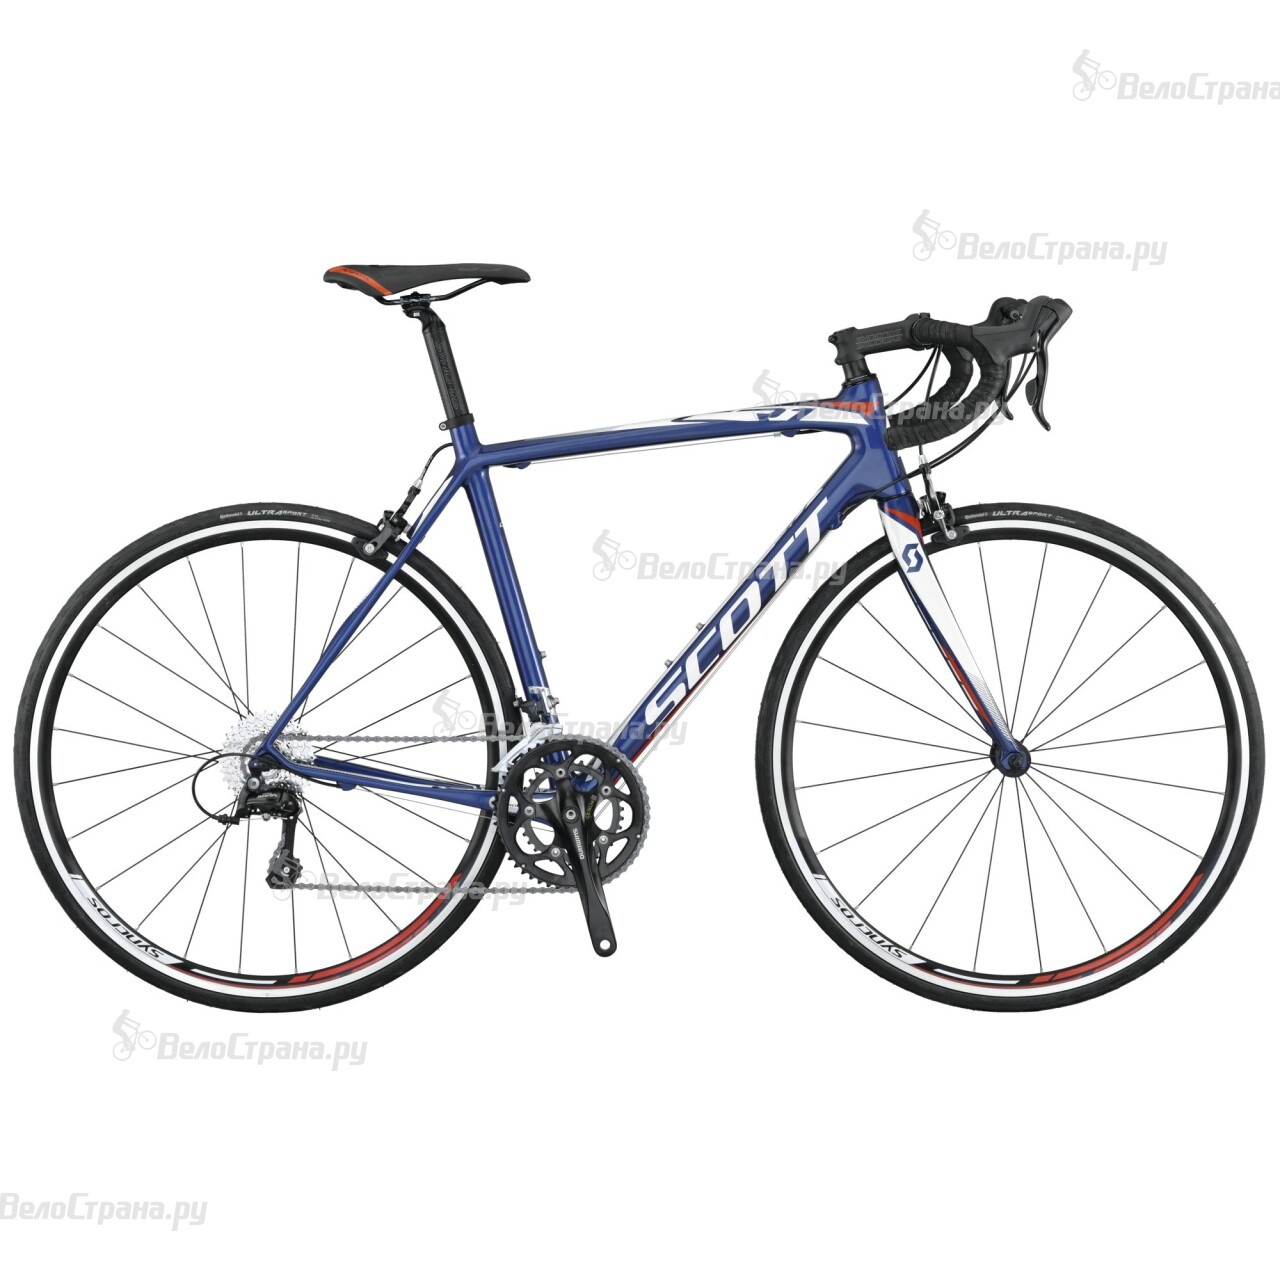 Велосипед Scott CR1 30 (2015) велосипед scott cr1 20 2017